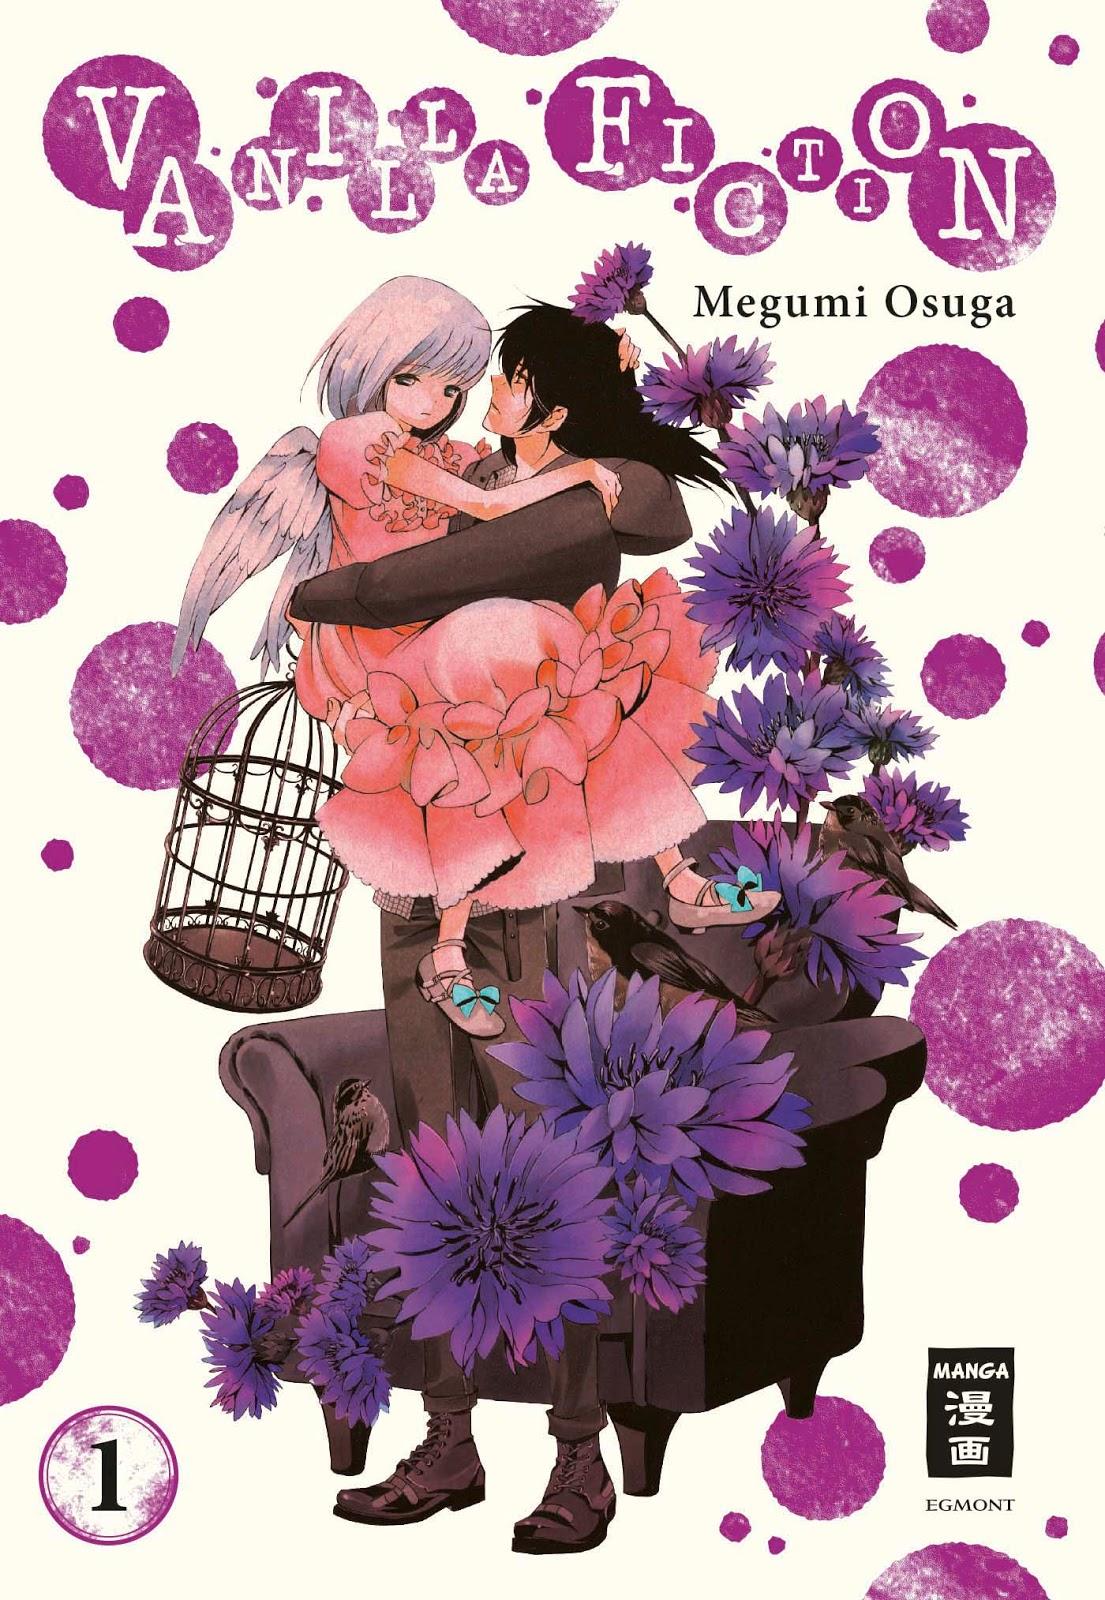 Awkward Dangos: [Manga Review] Vanilla Fiction 01-03